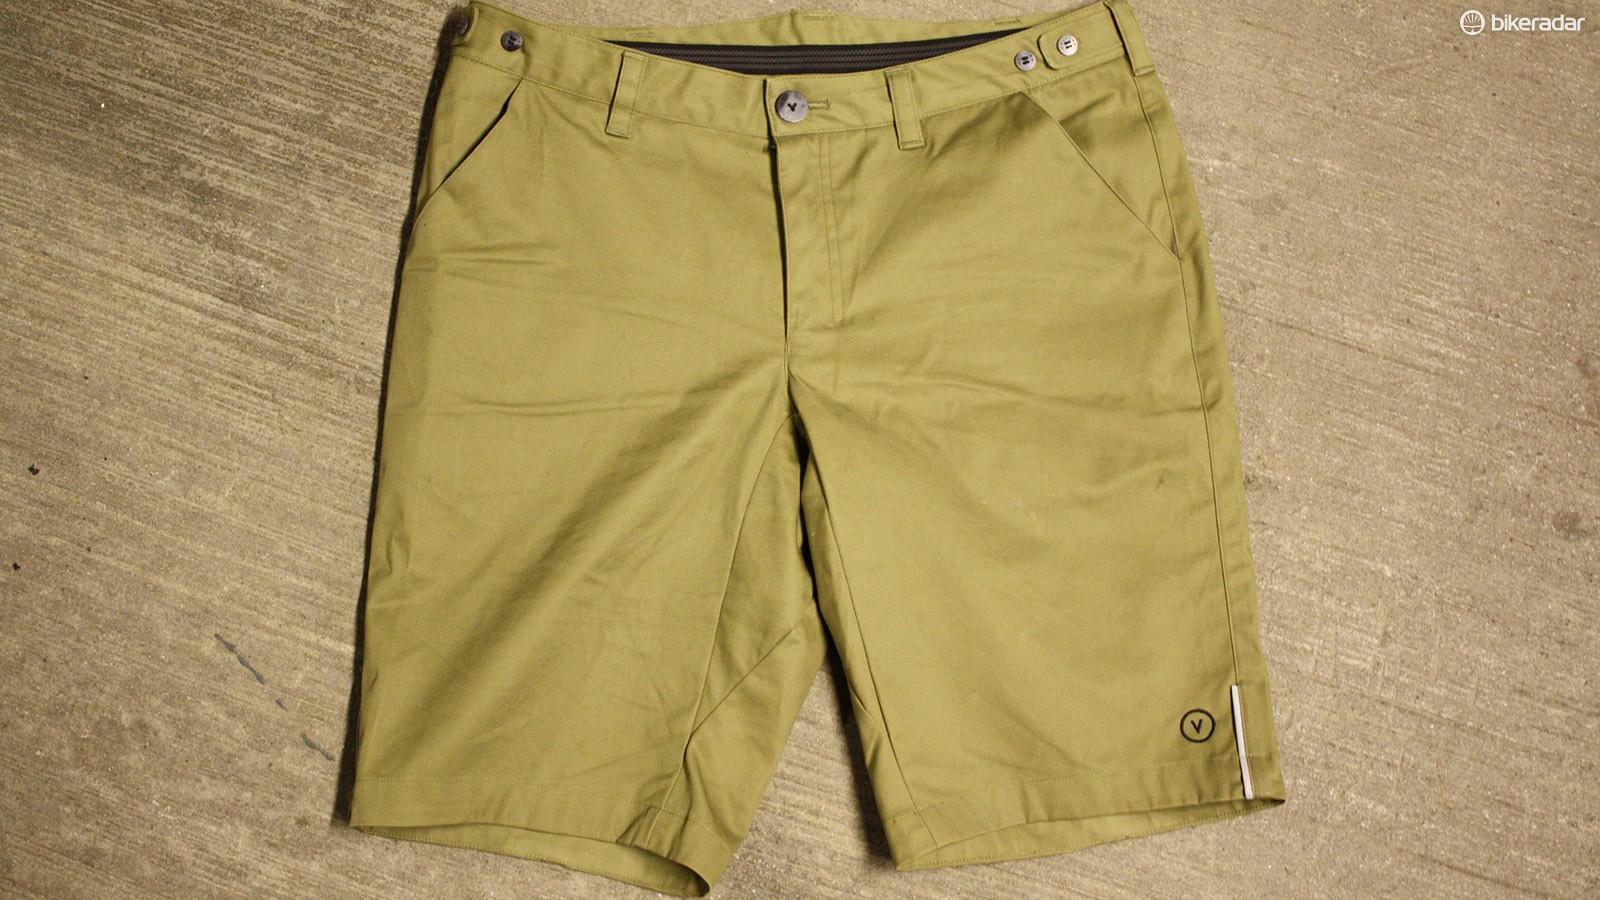 Vulpine men's cotton rain shorts